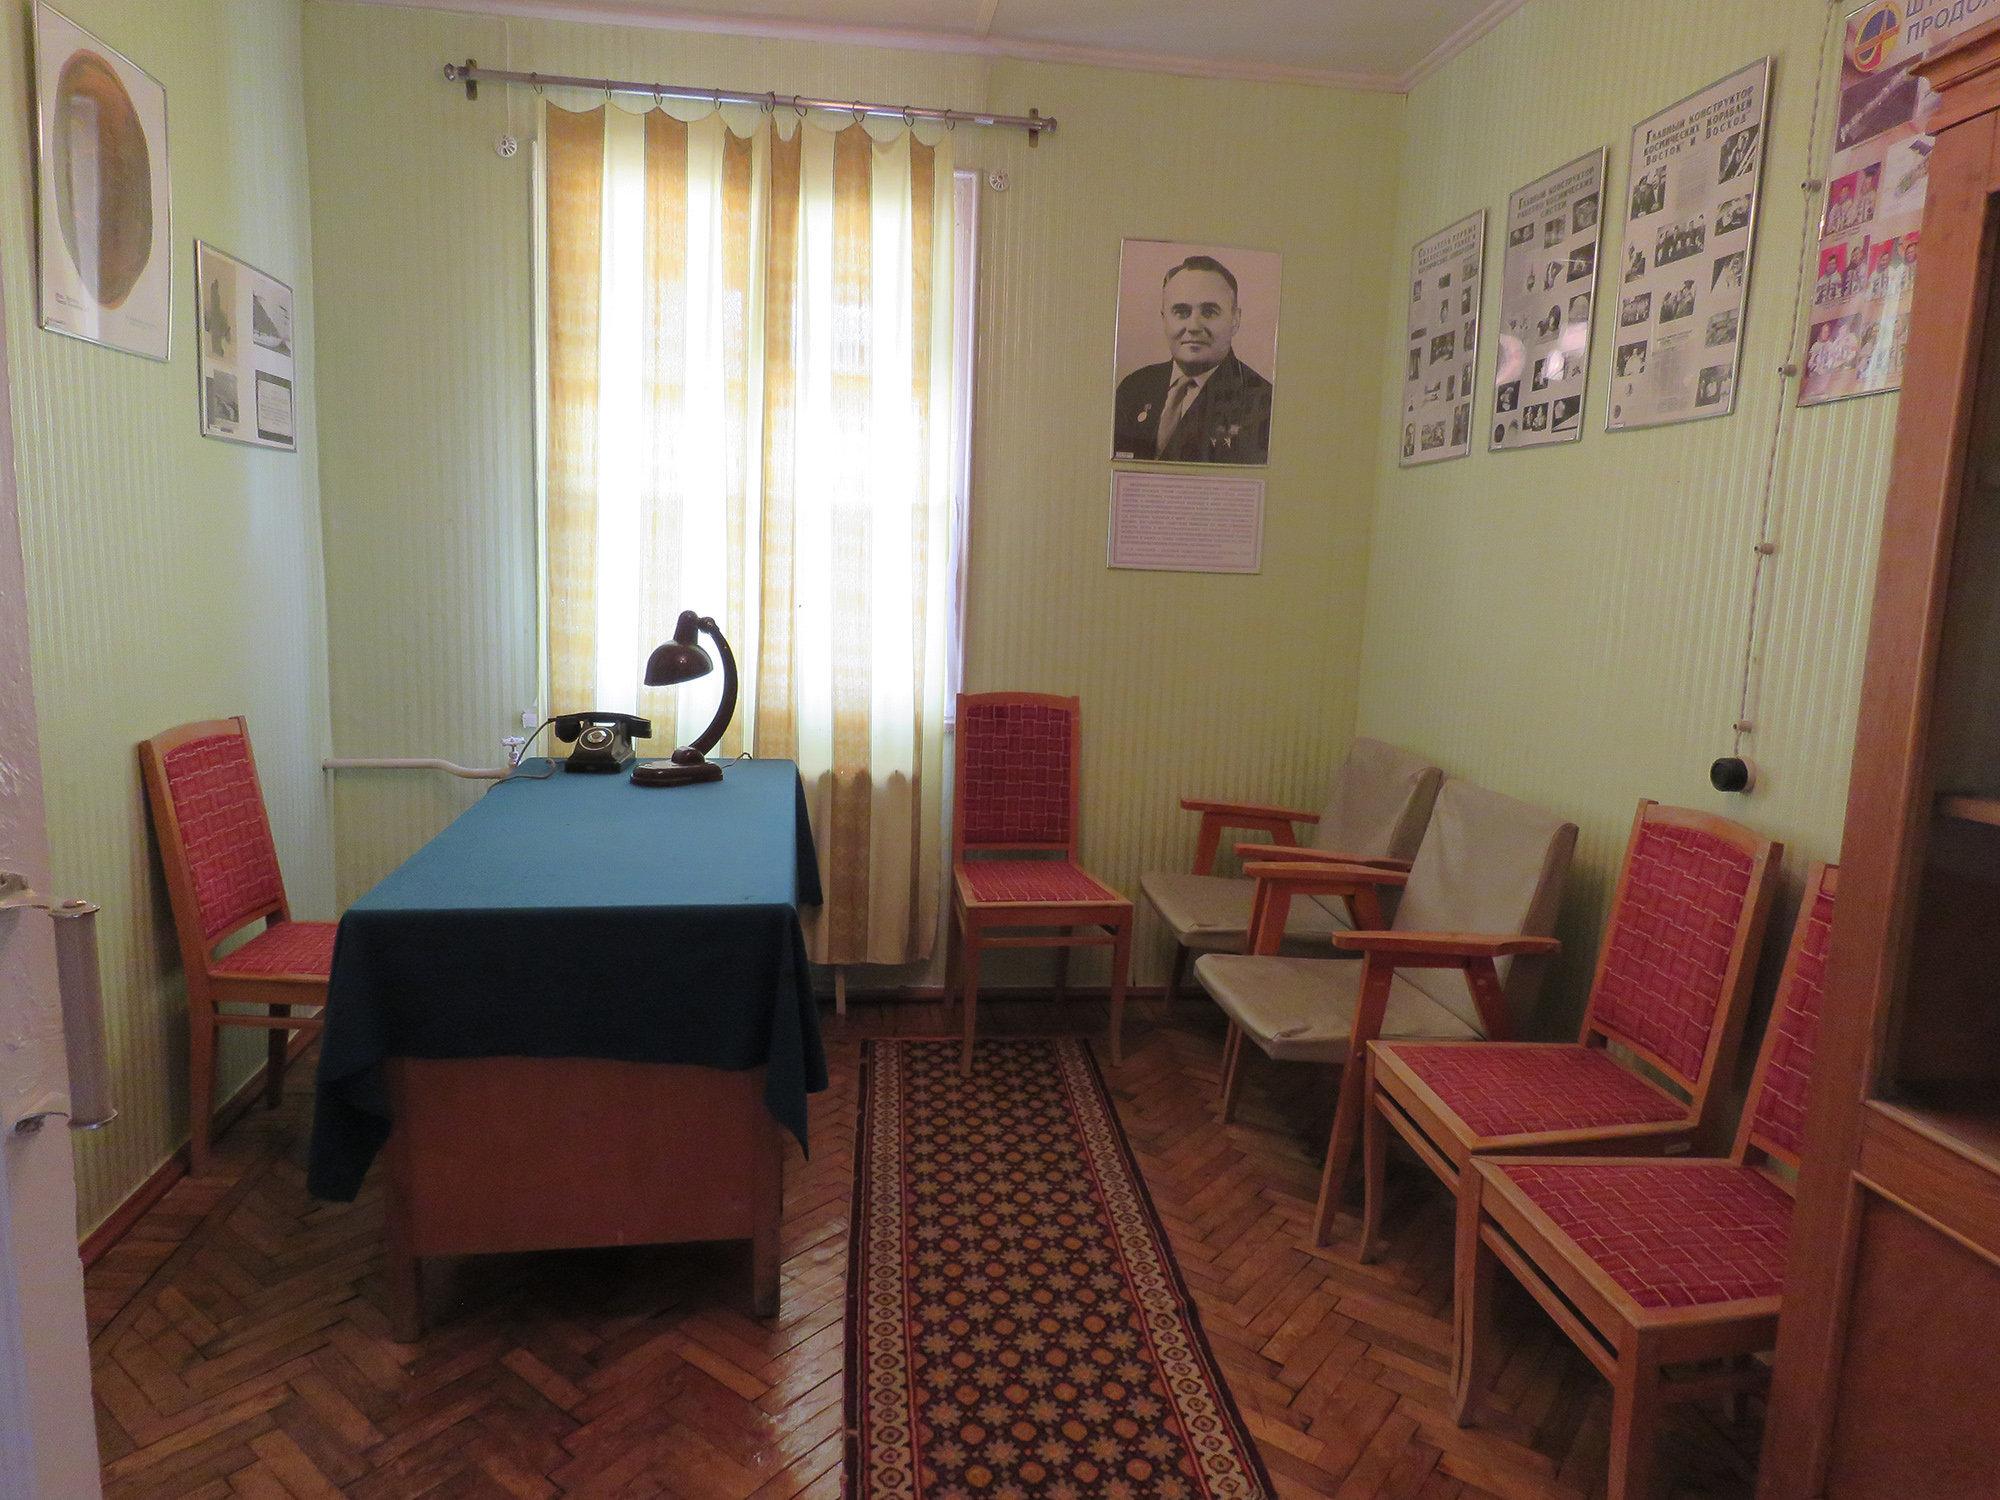 Аскетичная обстановка кабинета Сергея Королева